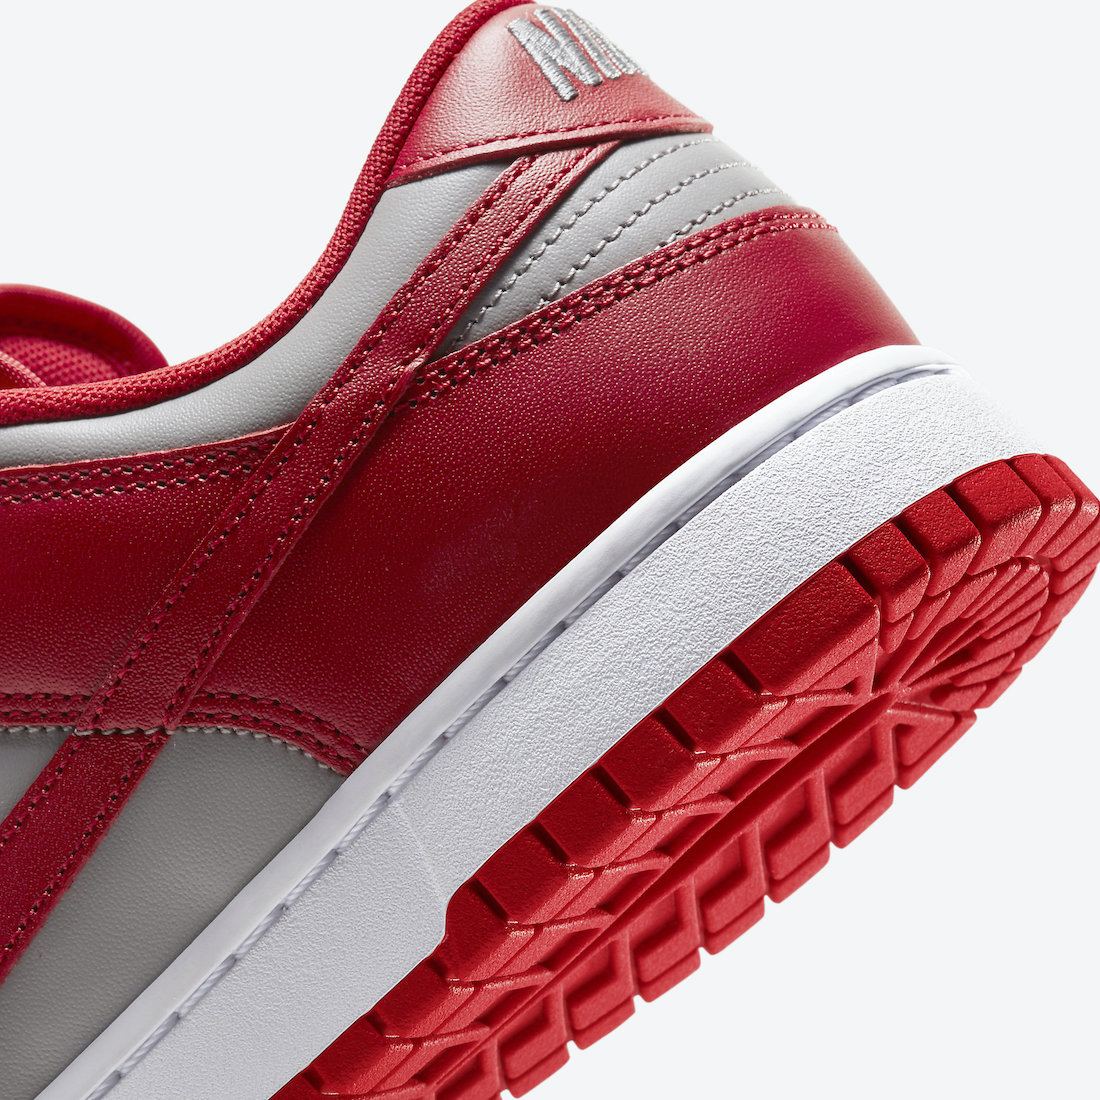 Nike-Dunk-Low-UNLV-DD1391-002-Release-Date-Price-7